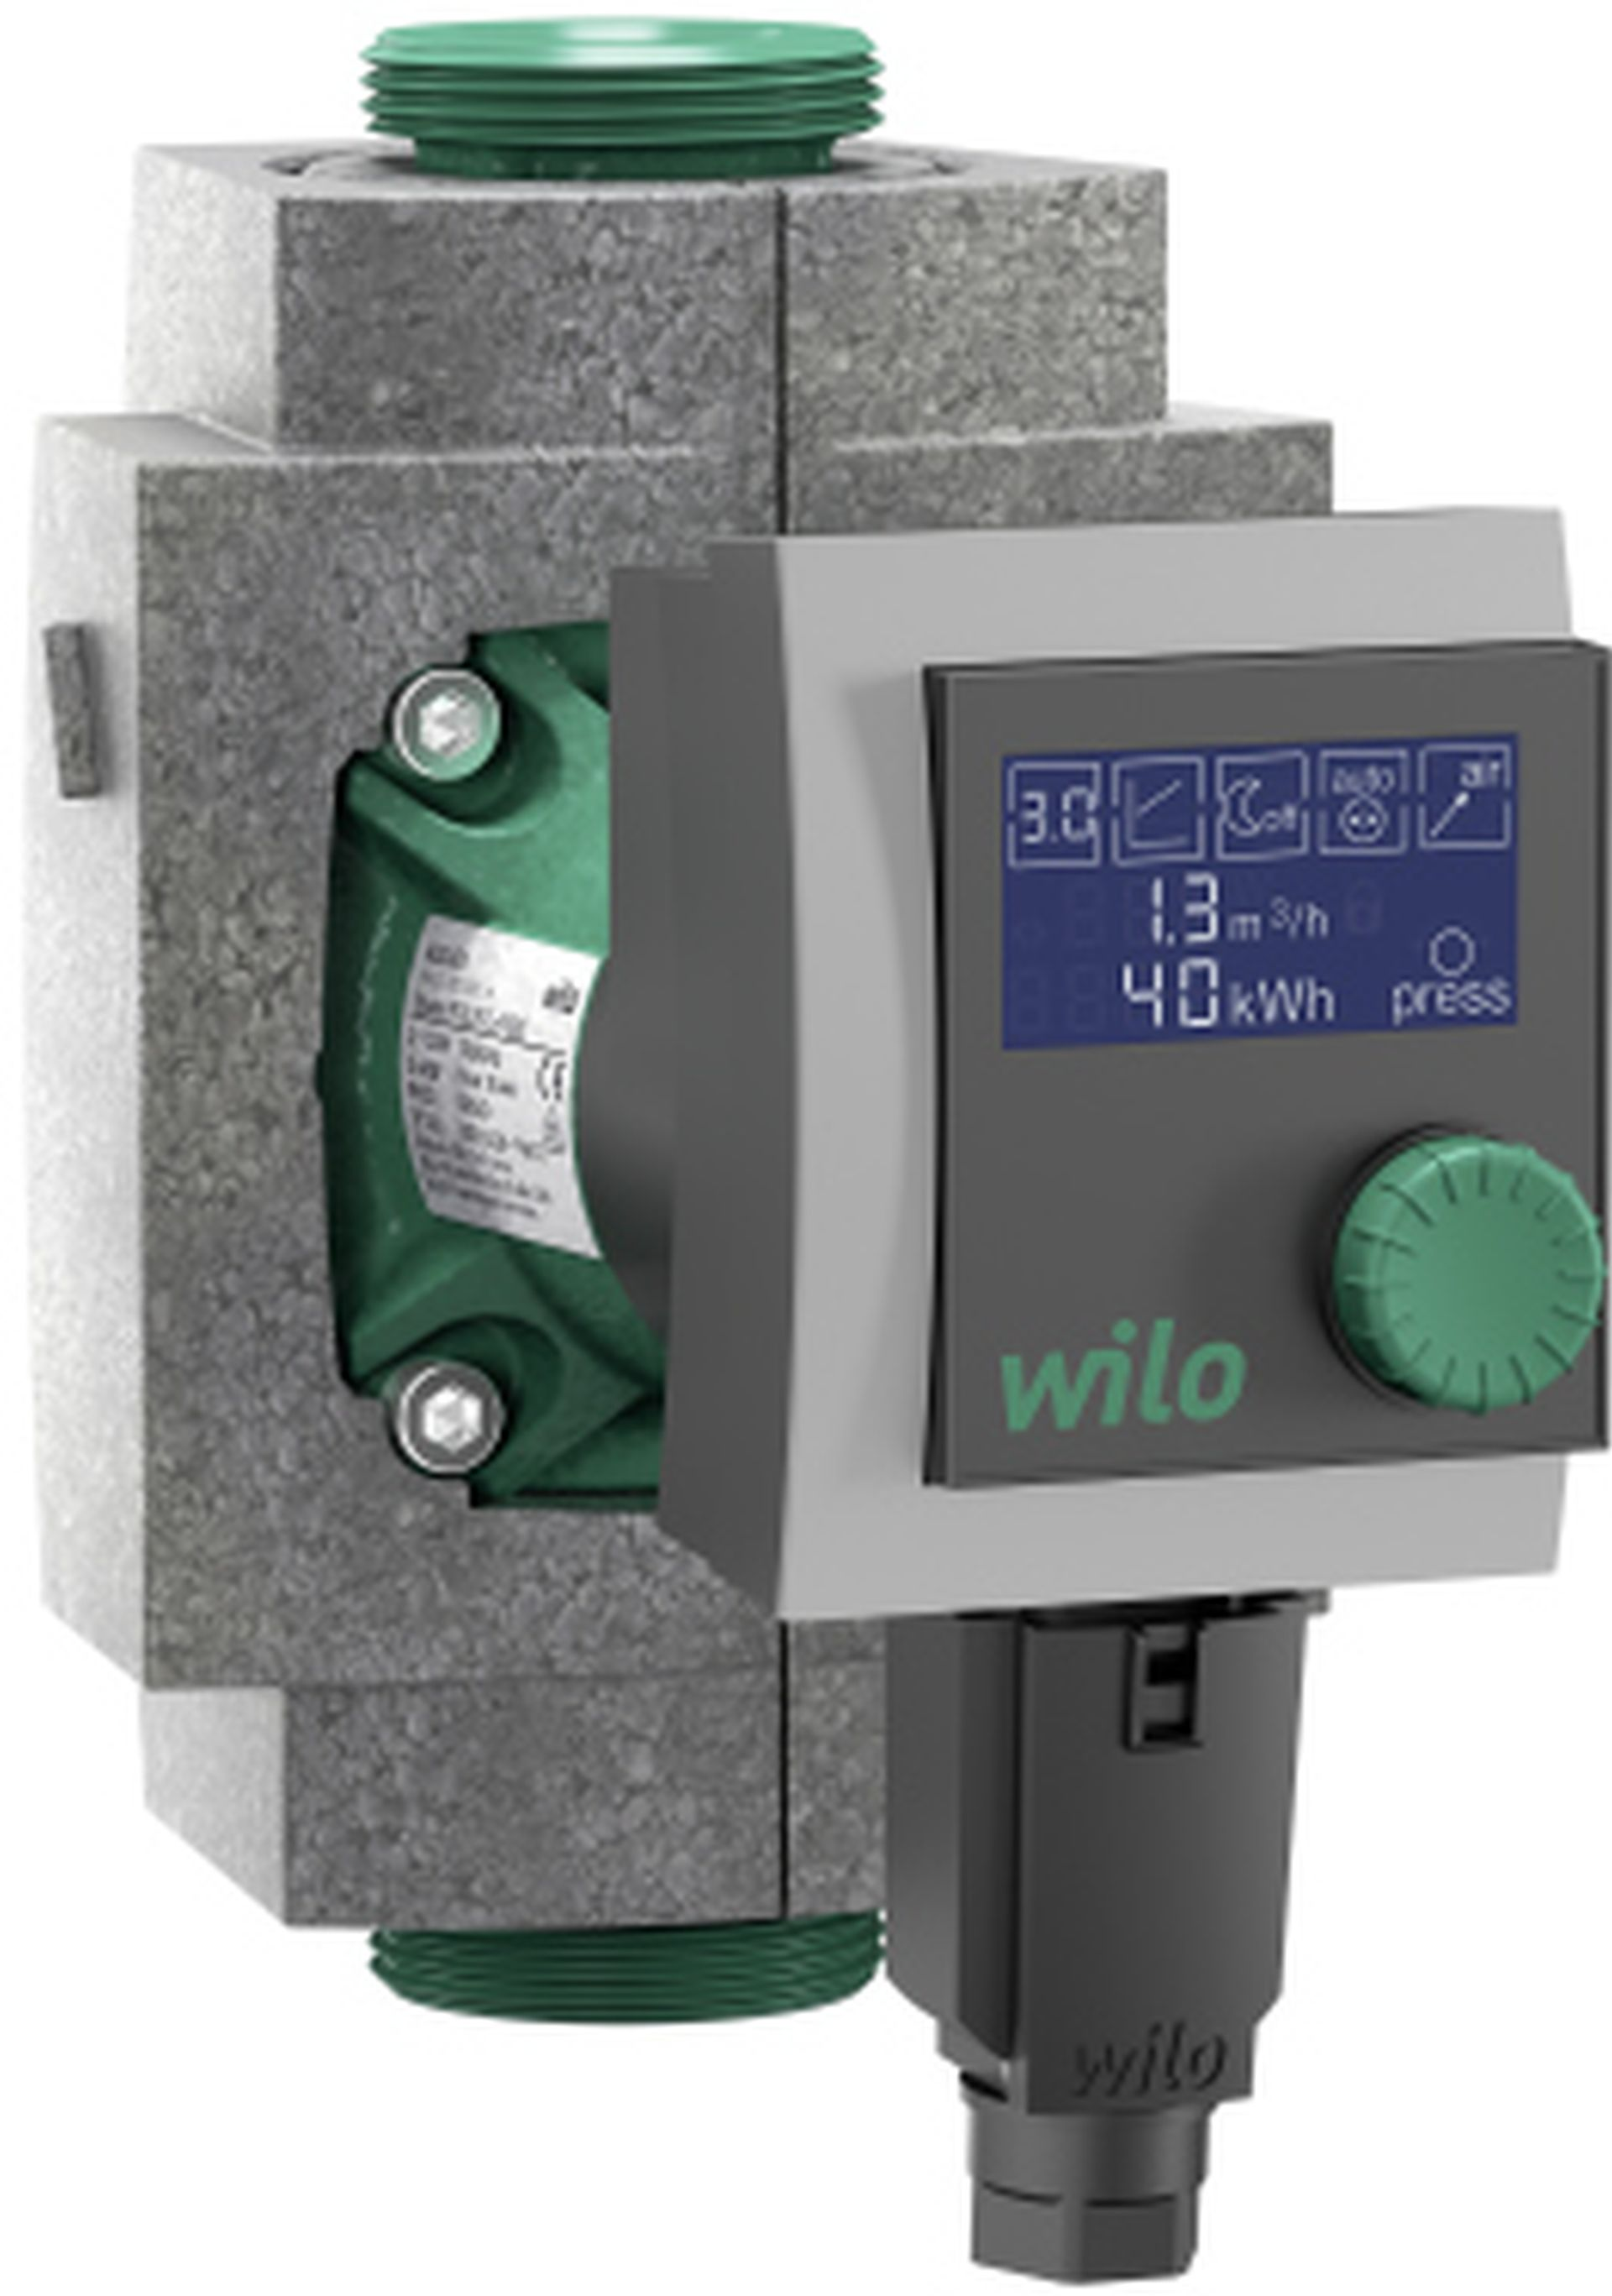 WILO Stratos PICO 25/1-6 N 180 mm oběhové čerpadlo 4216618